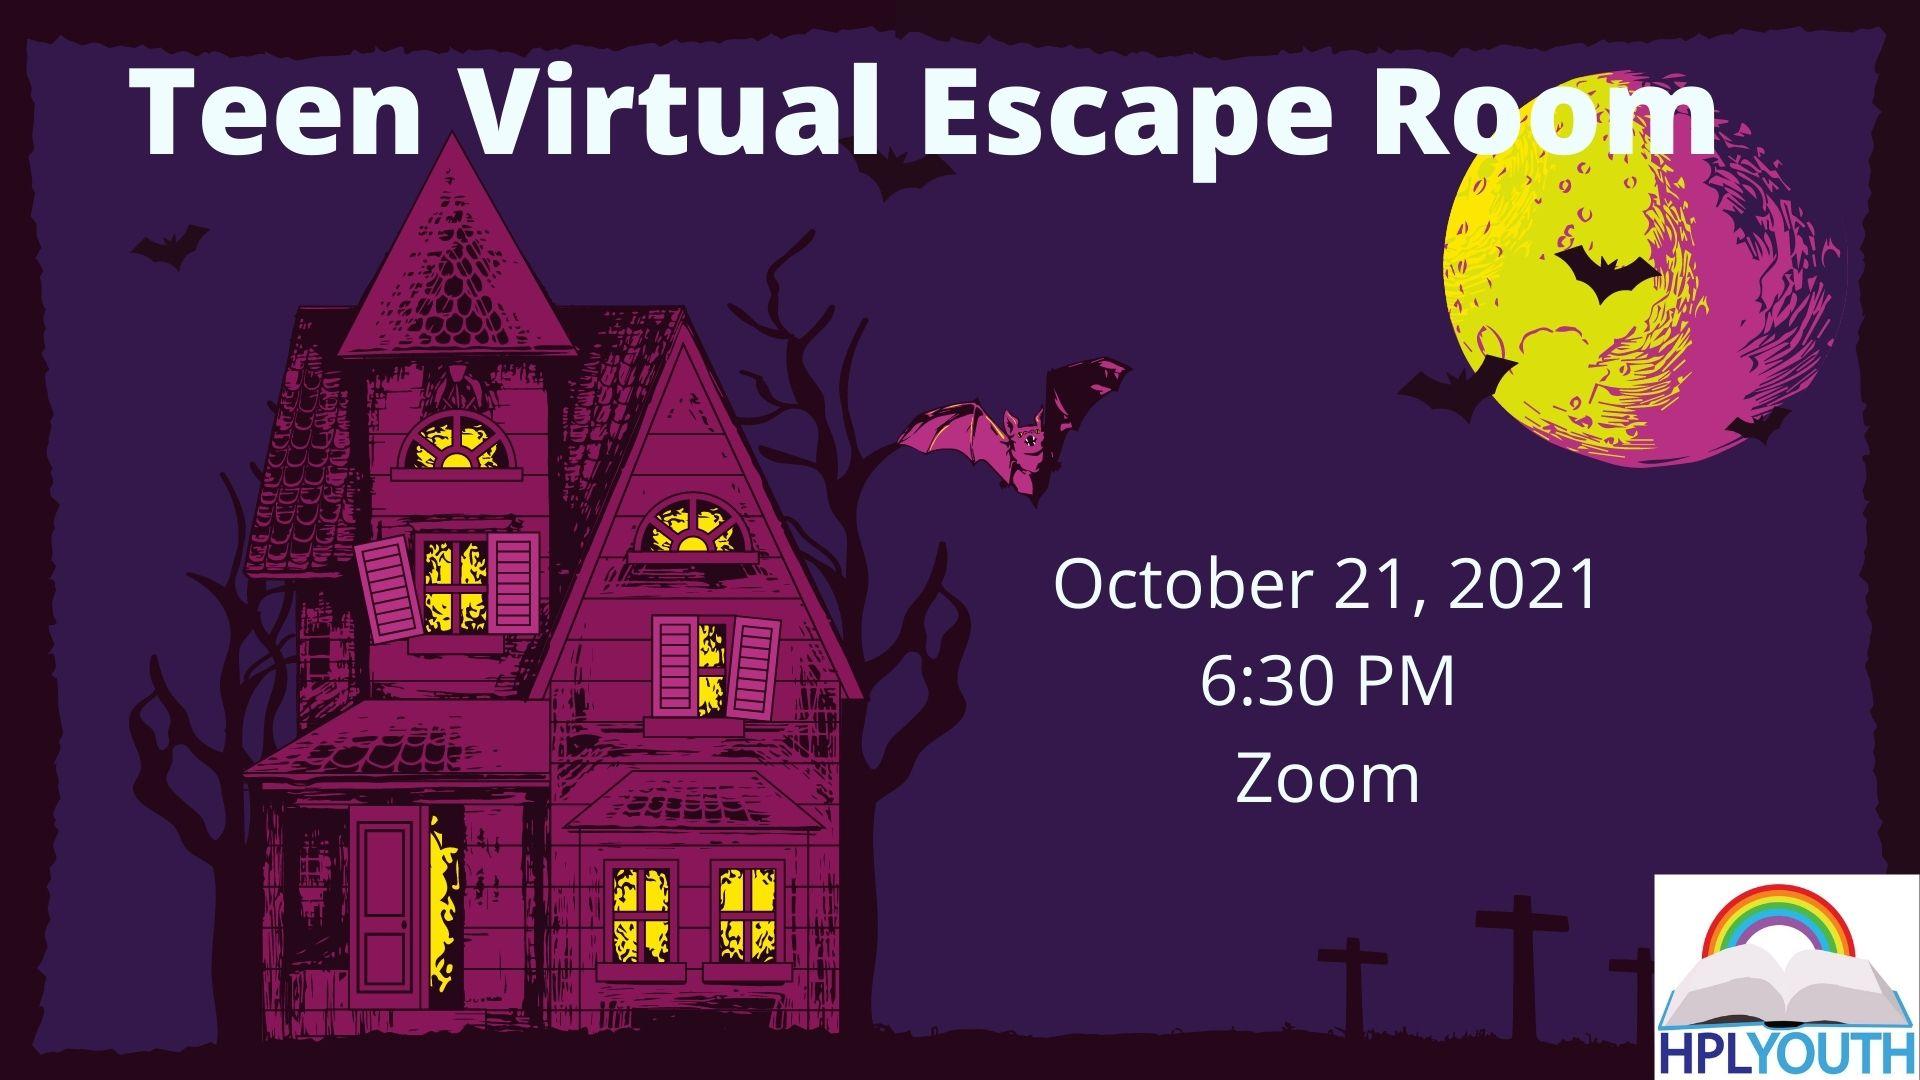 Teen Virtual Escape Room